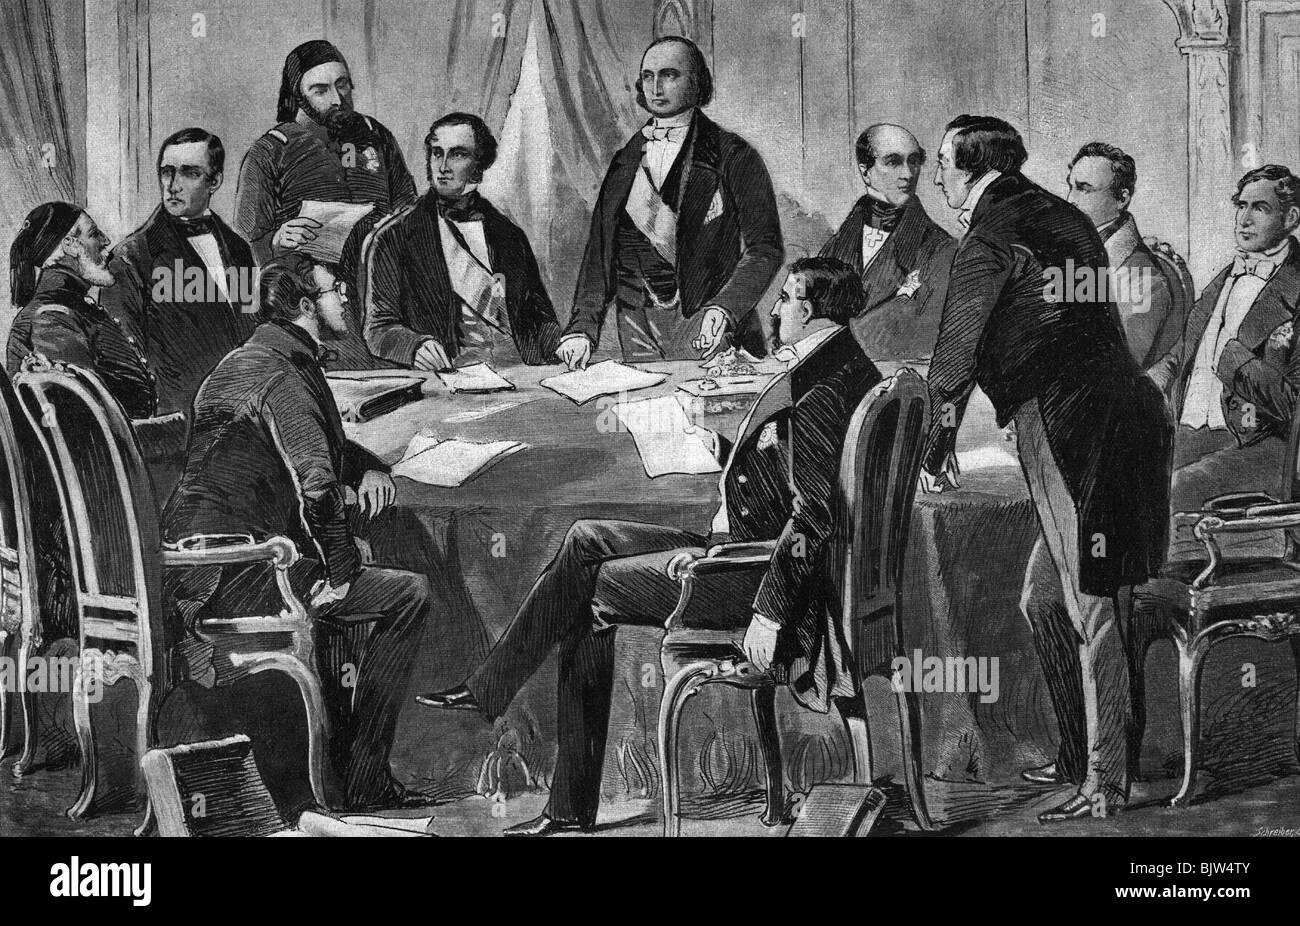 events, Crimean War 1853 - 1856, Treaty of Paris, 30.3.1856, delegates form Russia, Great Britain, France, Sardinia - Stock Image